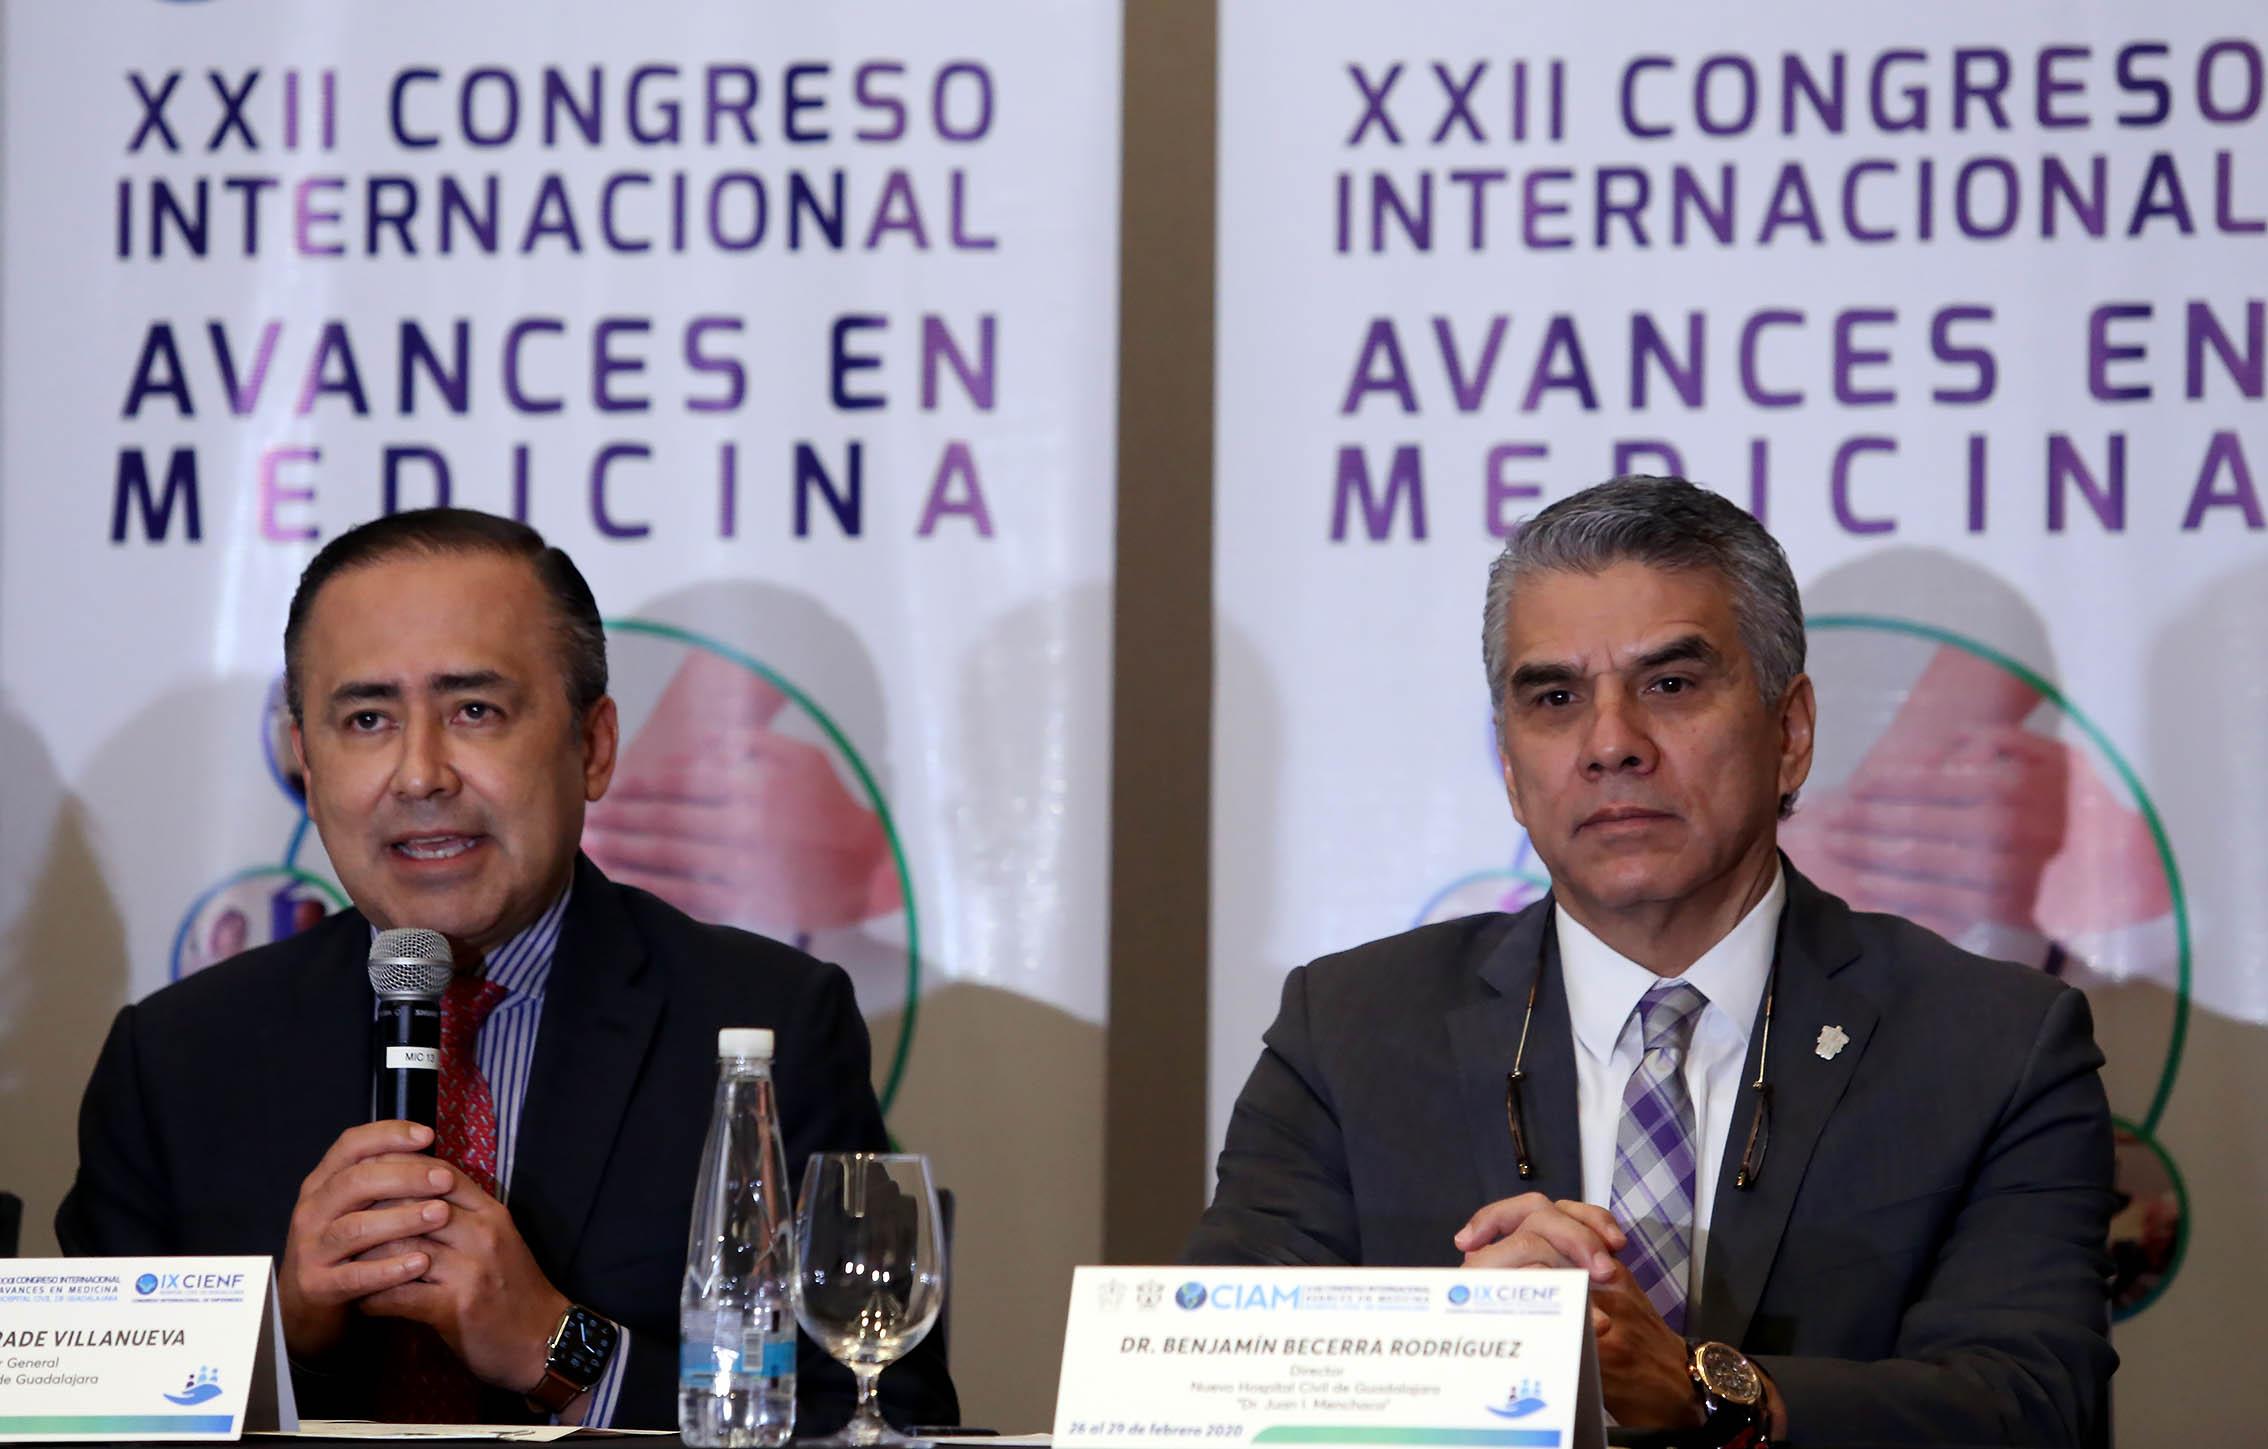 Dr Jaime Andrade Villanueva, Dr Benjamin Becerra Rodríguez